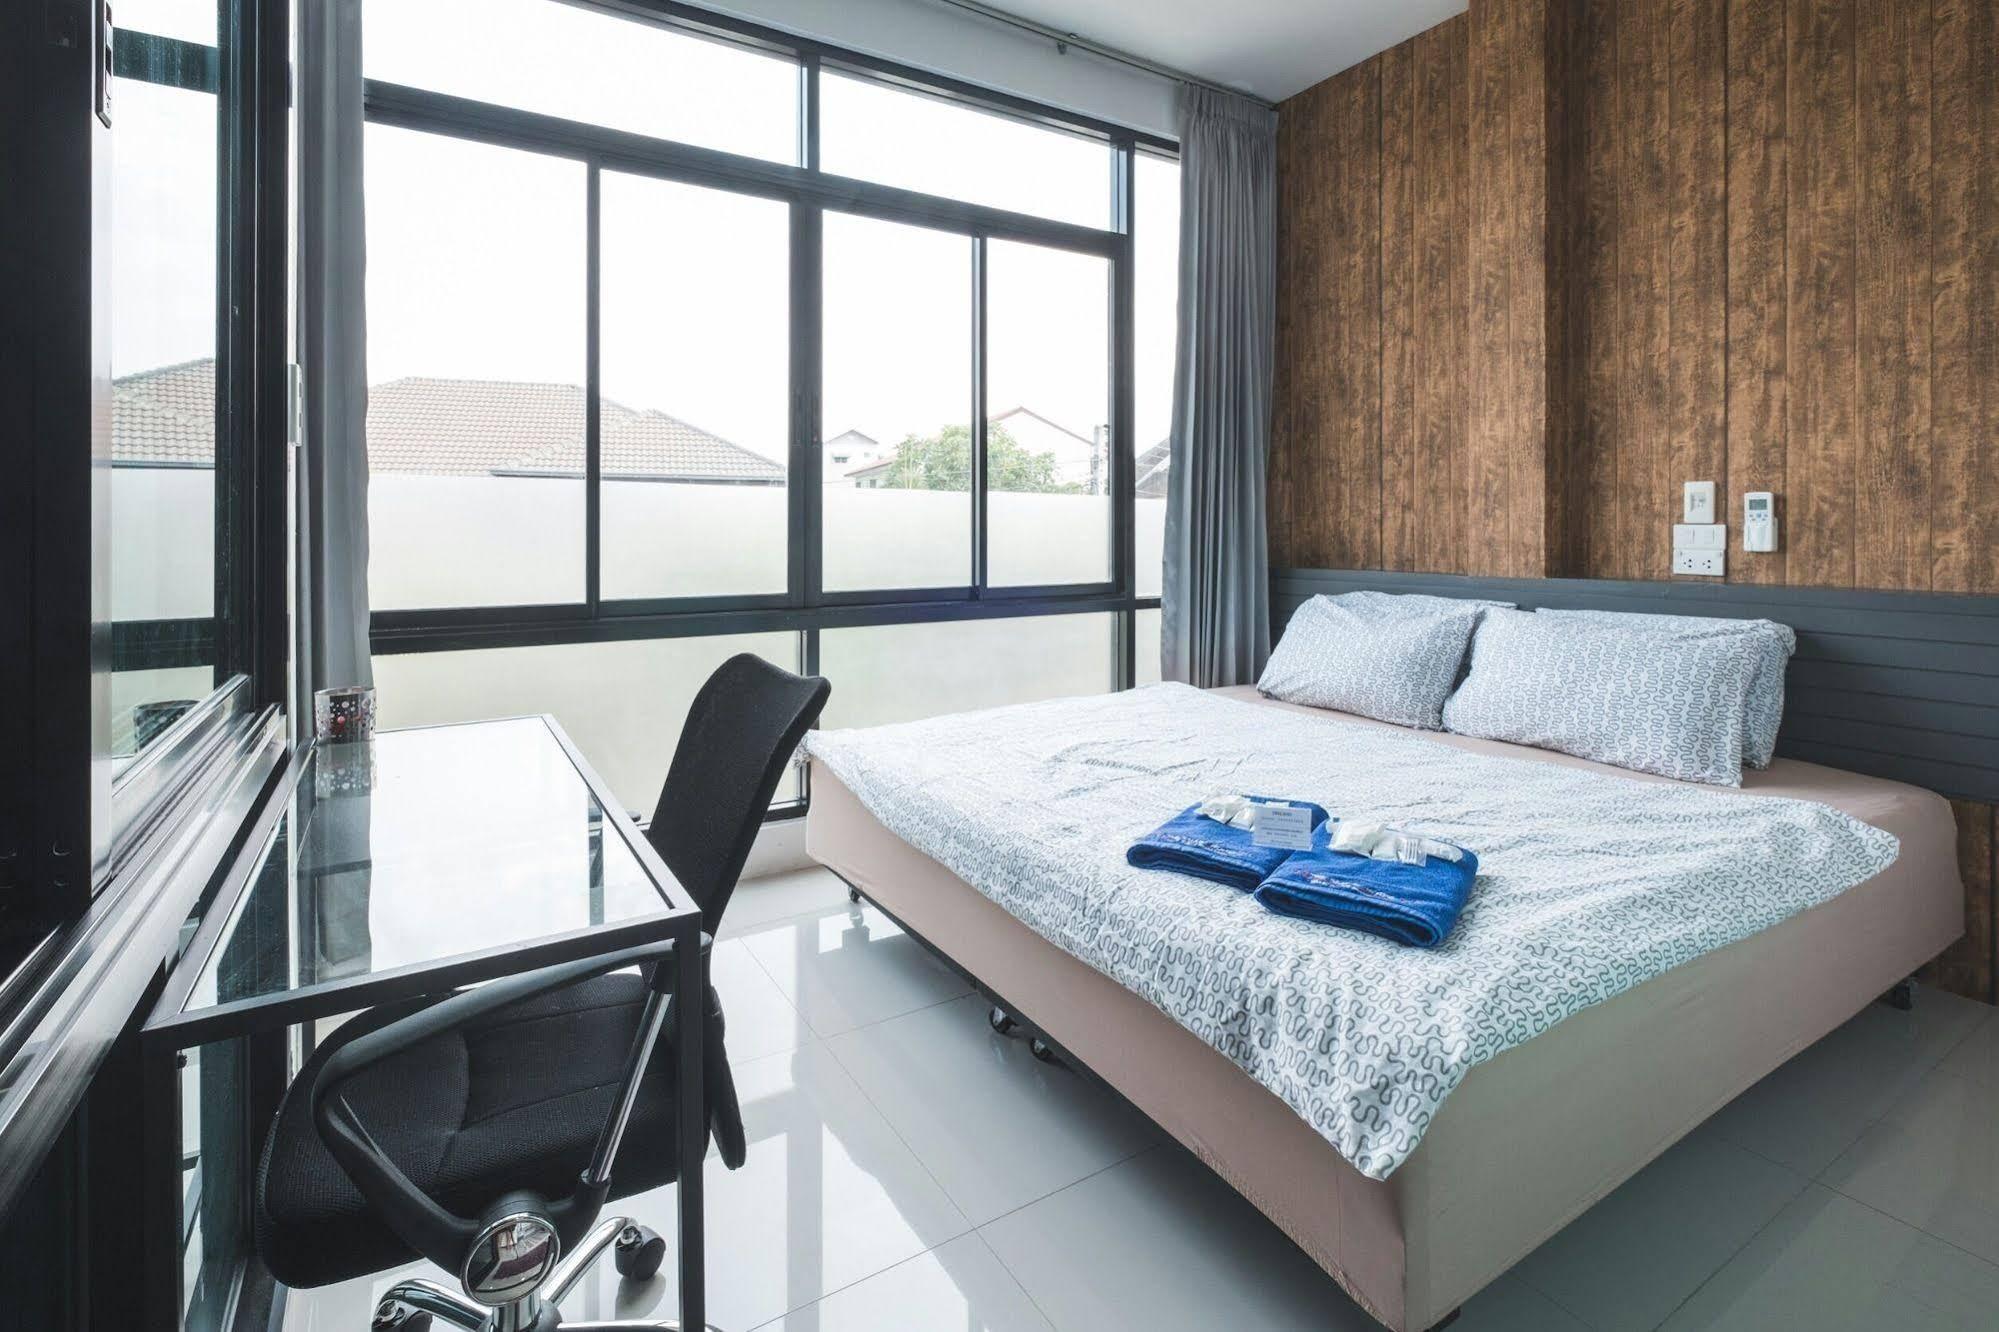 The Smart Hostel